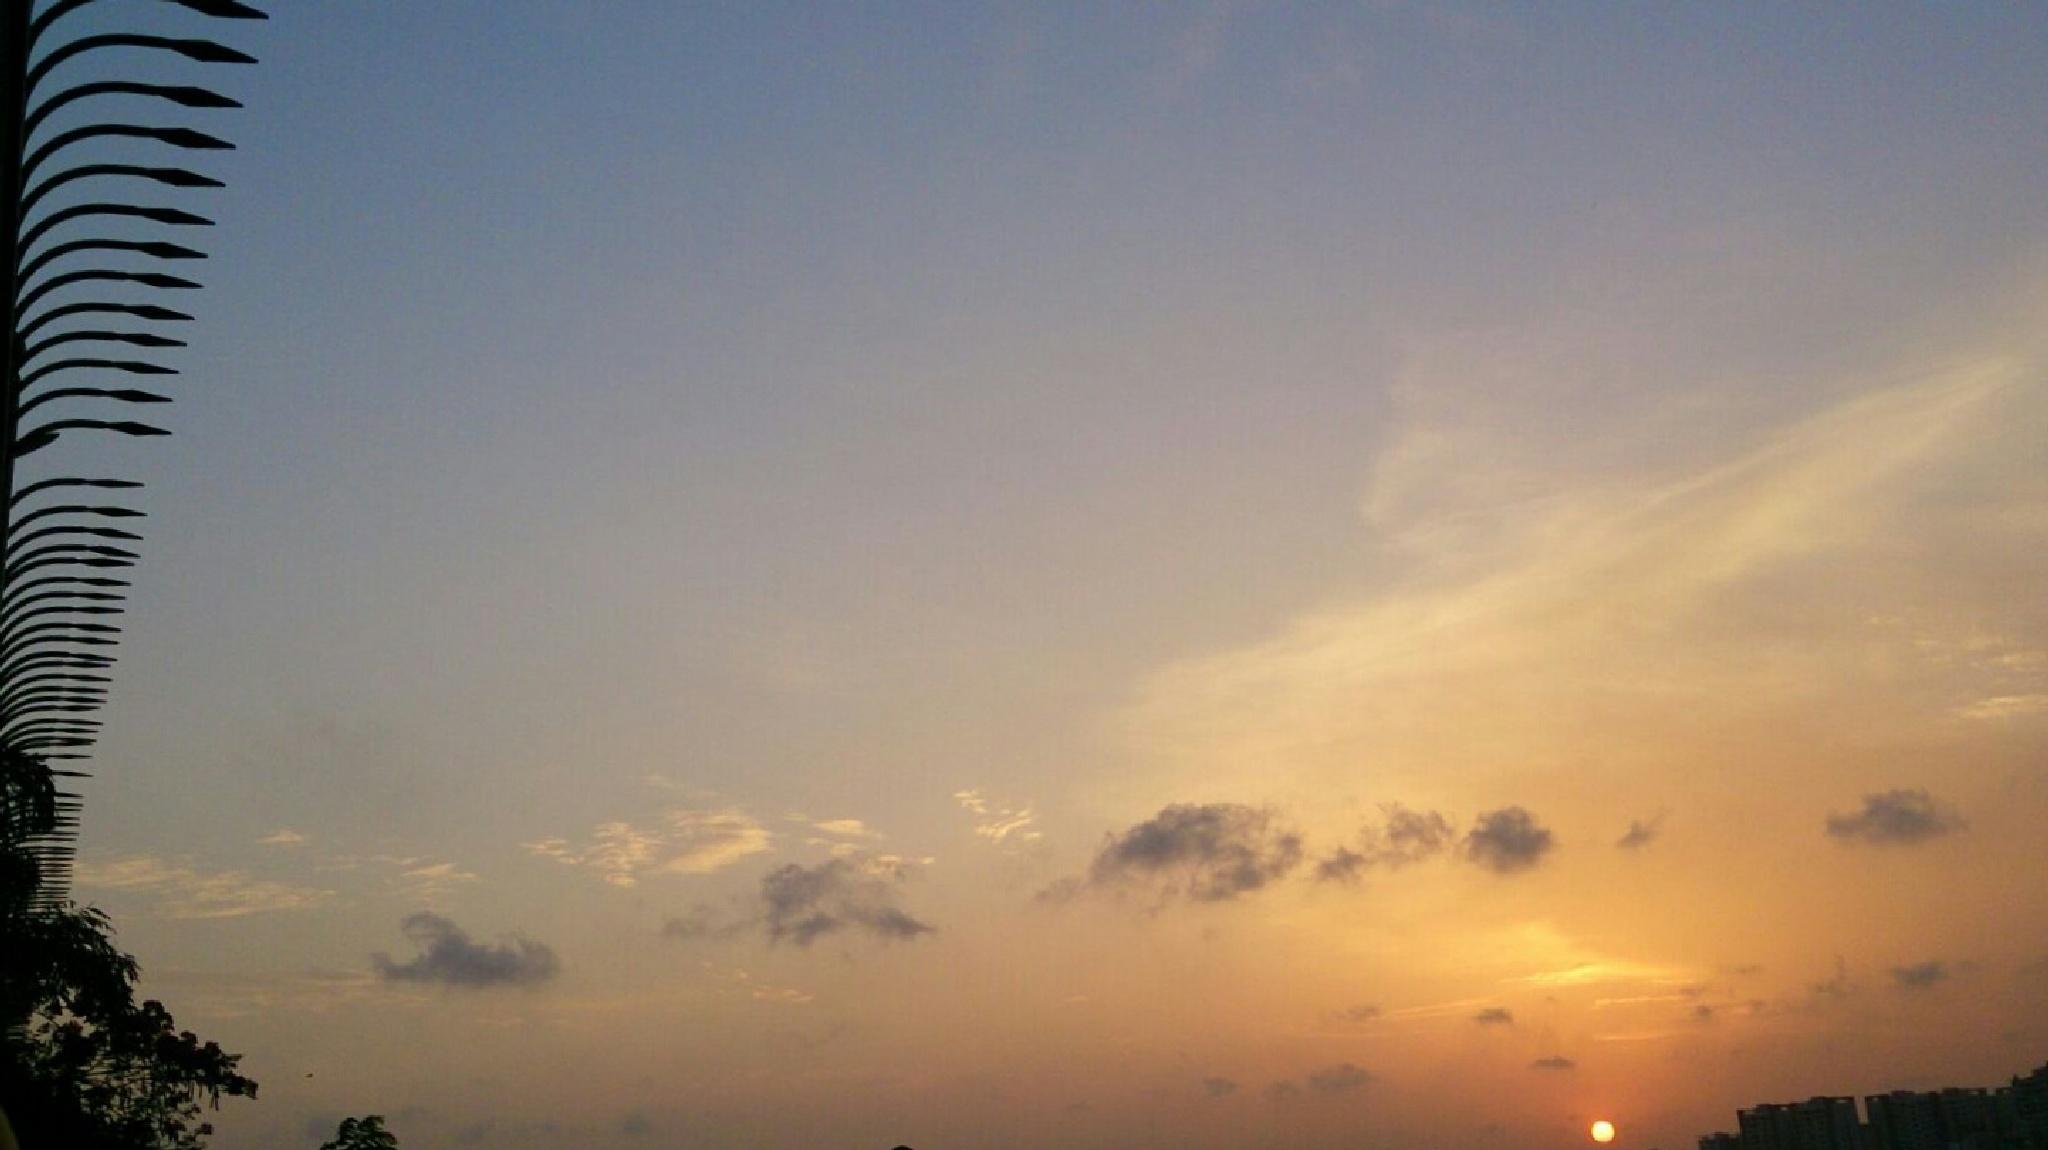 sunset by falsparsh